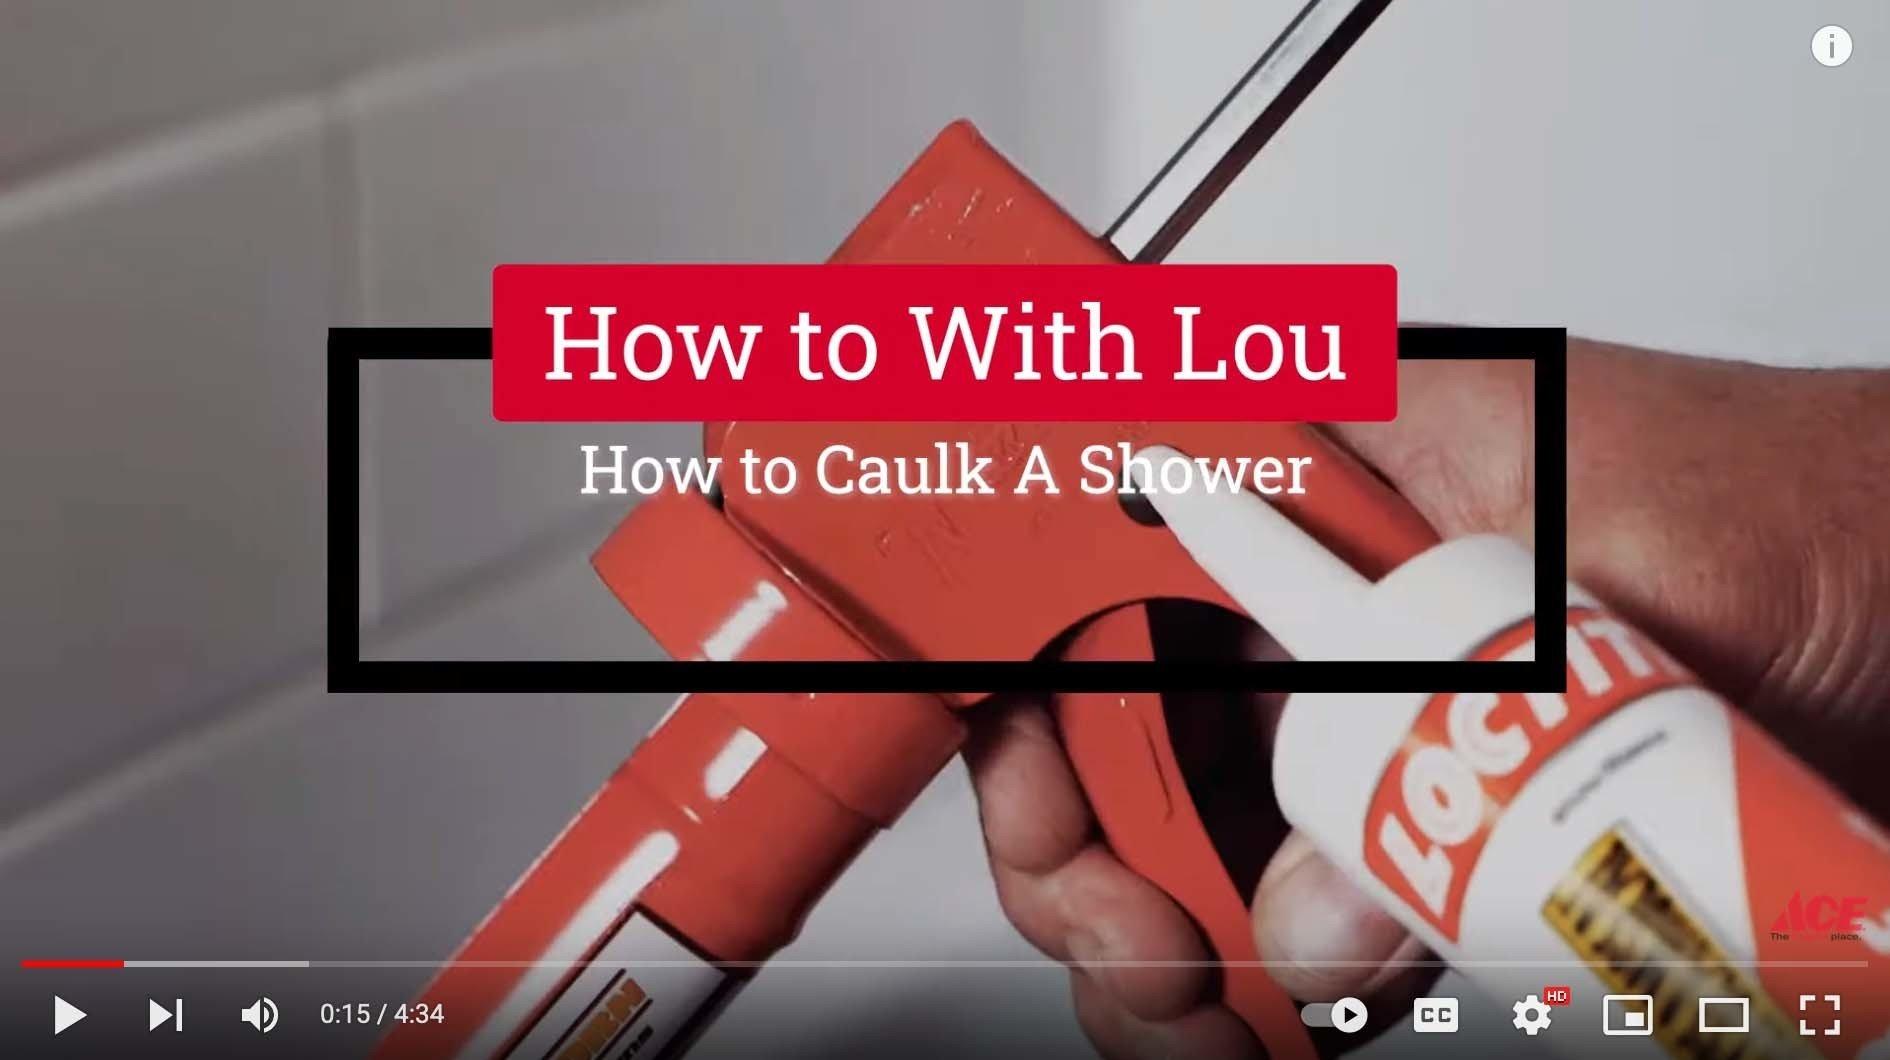 How to Caulk a Shower